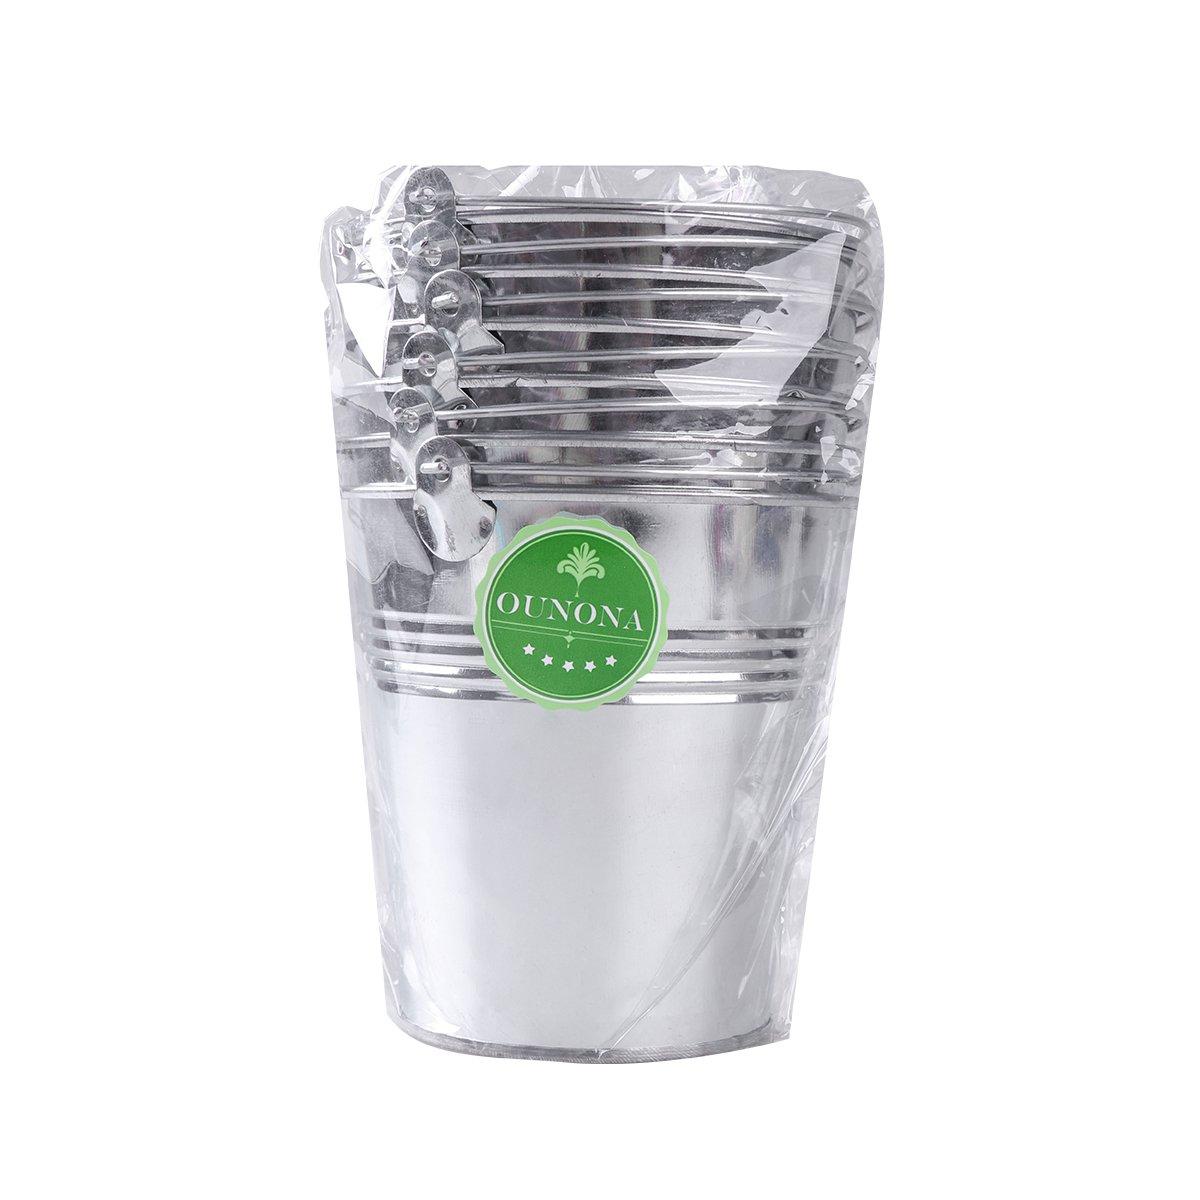 OUNONA Mini Metal Bucket Set of 6 /Mini Food Containers/Succulent Wedding Buckets 10.5x7.2x10.5cm by OUNONA (Image #8)